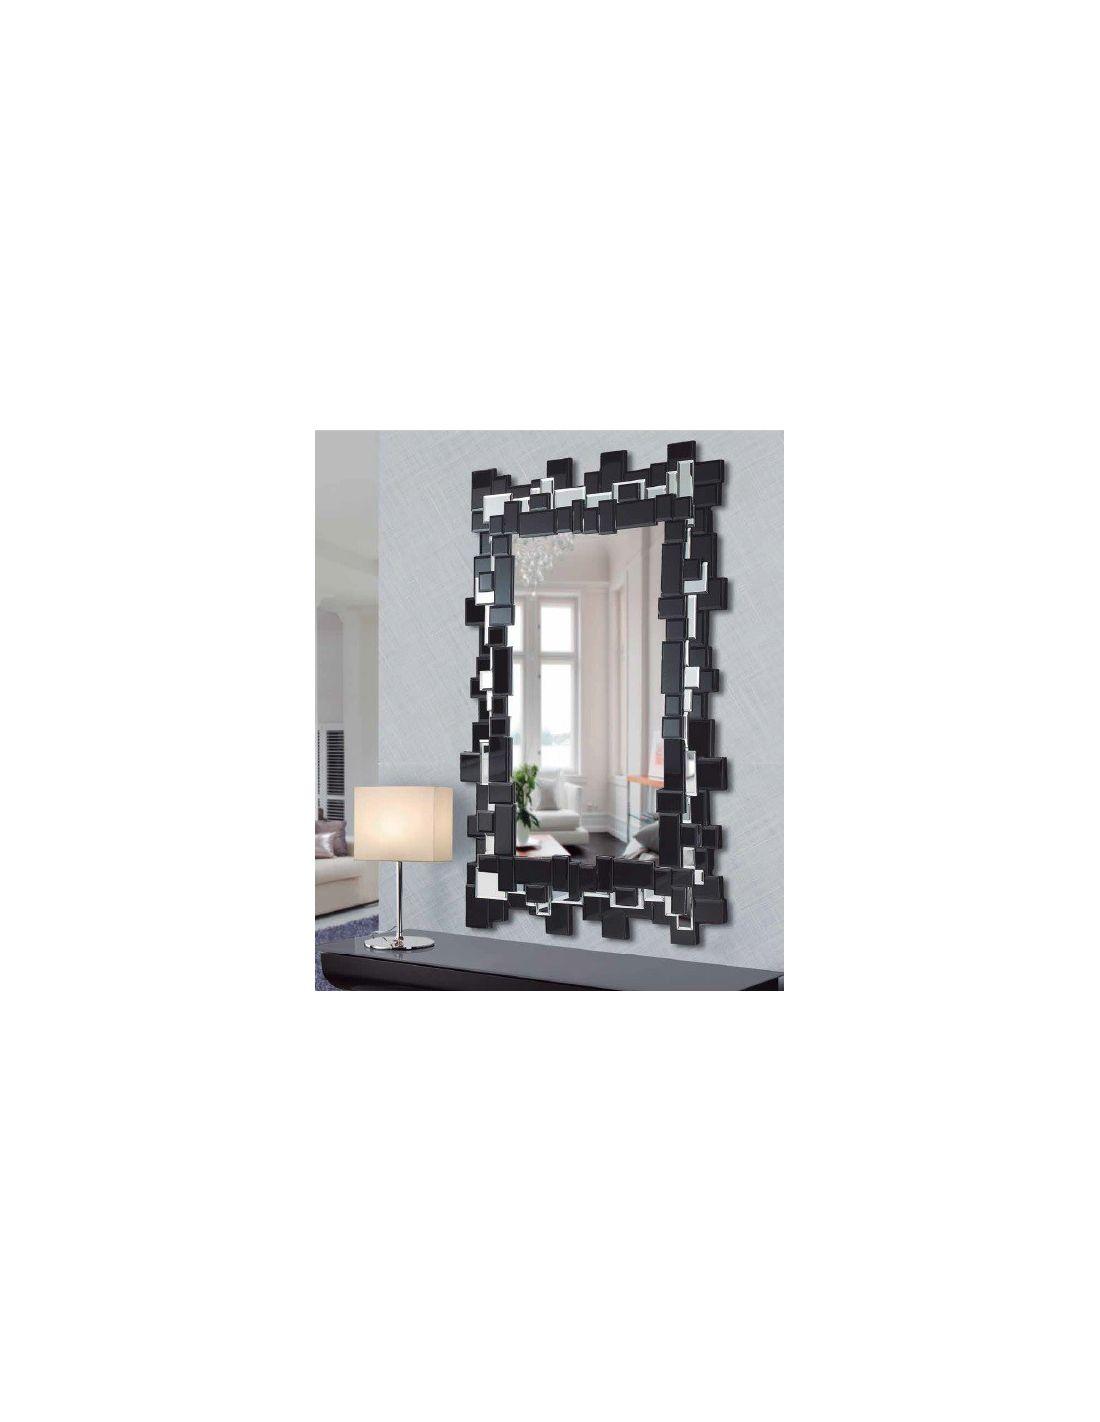 Compra espejos negros de dise o online env o gratis for Compra de espejos